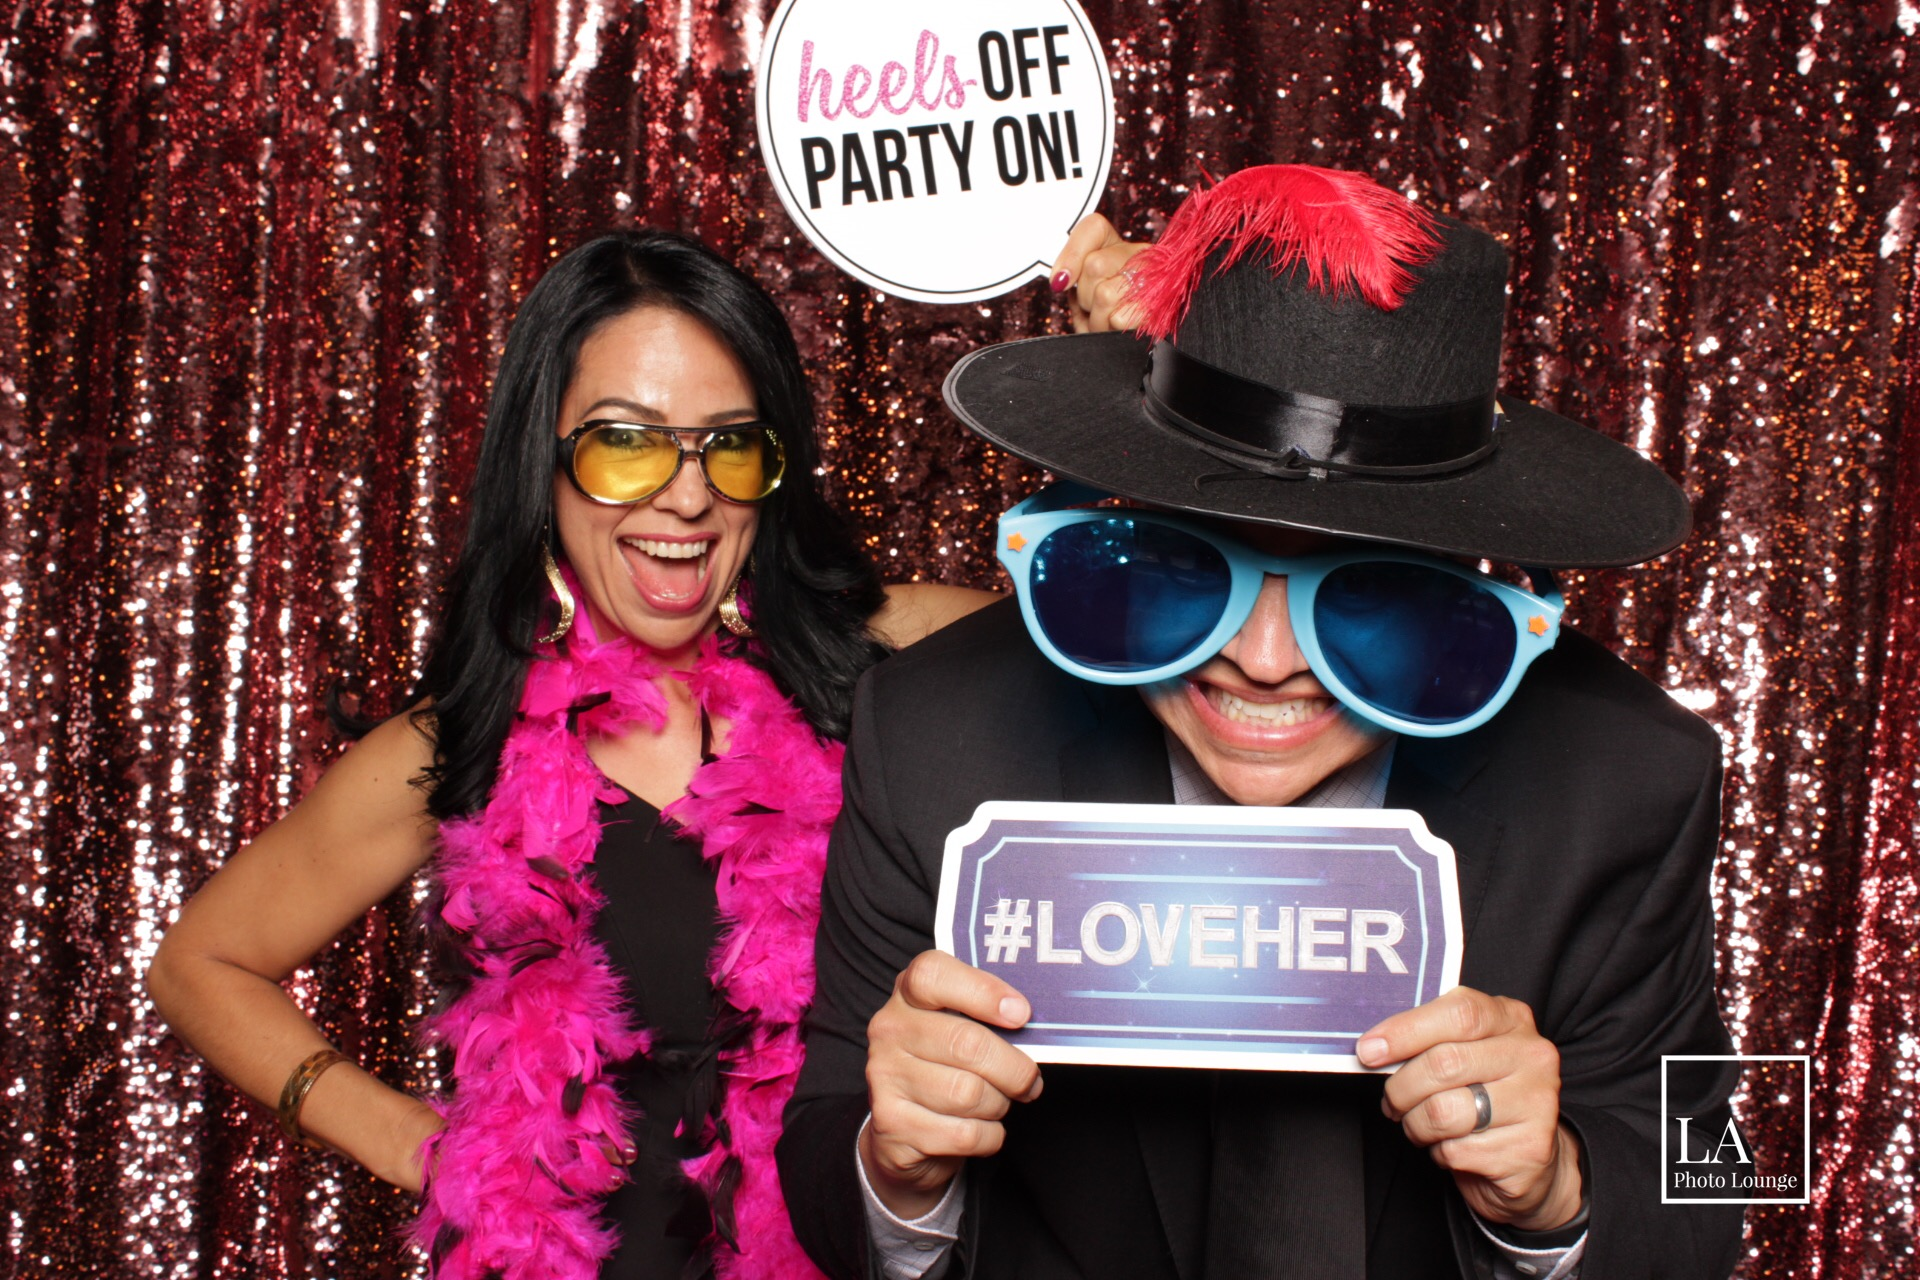 Copyright LA Photo Lounge